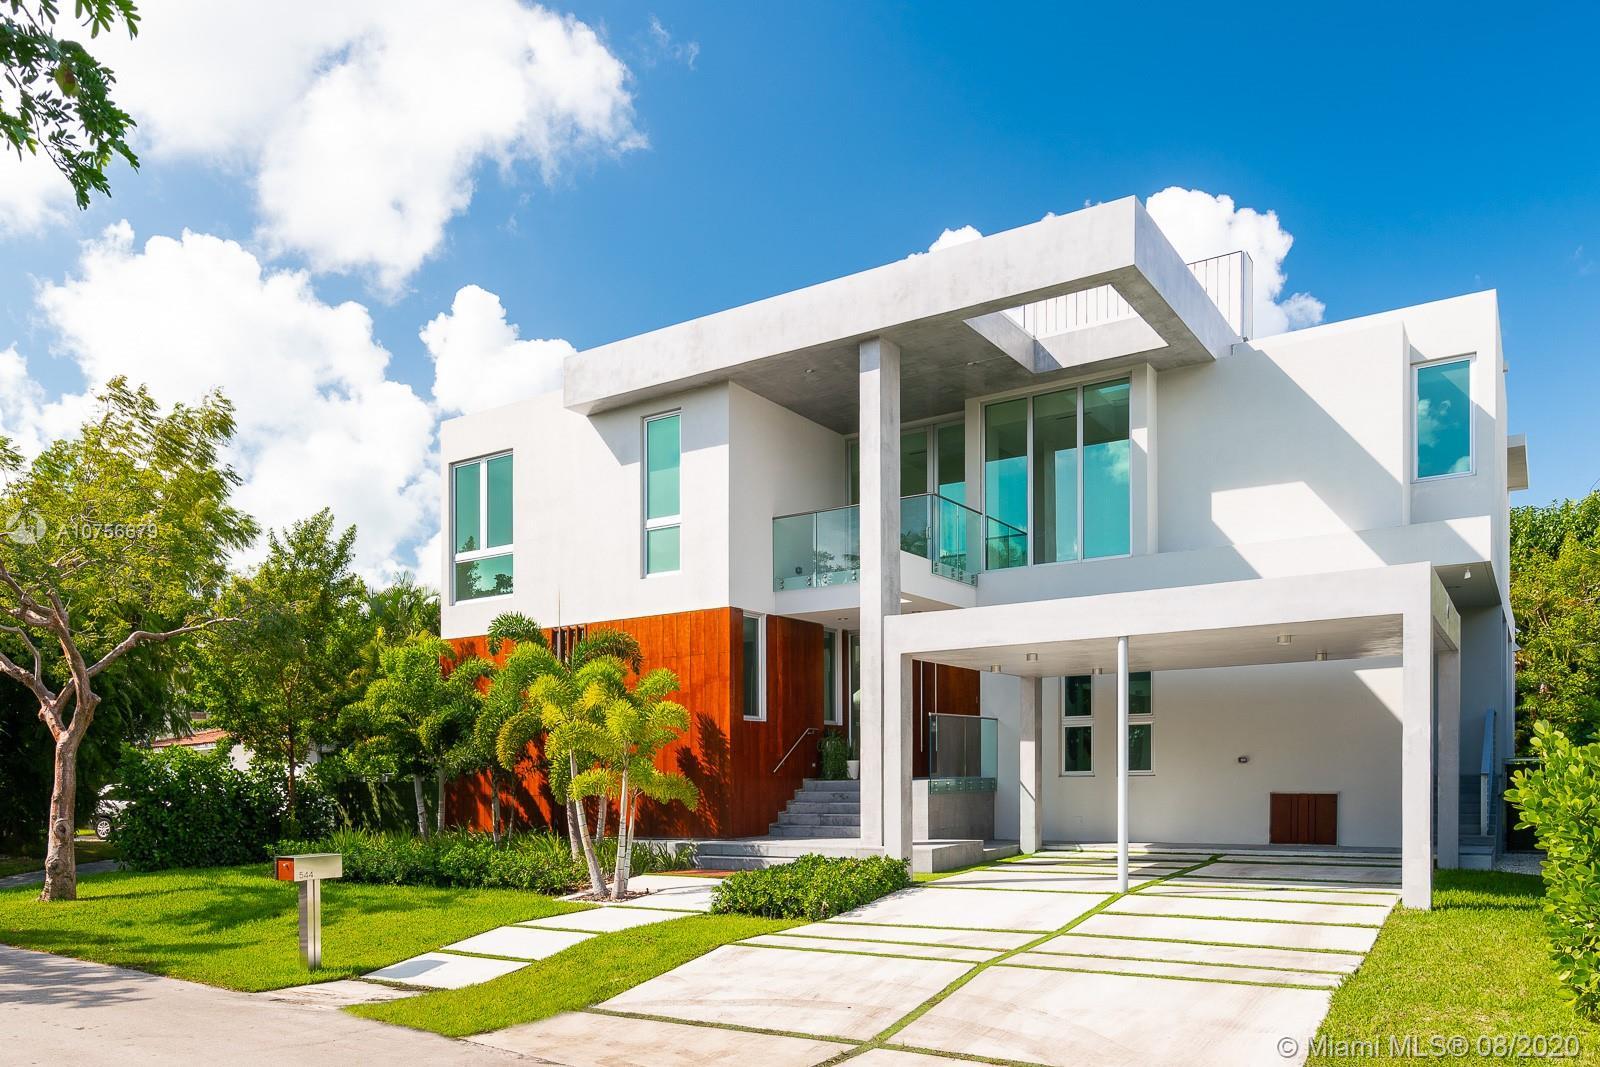 544 ridgewood rd - Key Biscayne, Florida